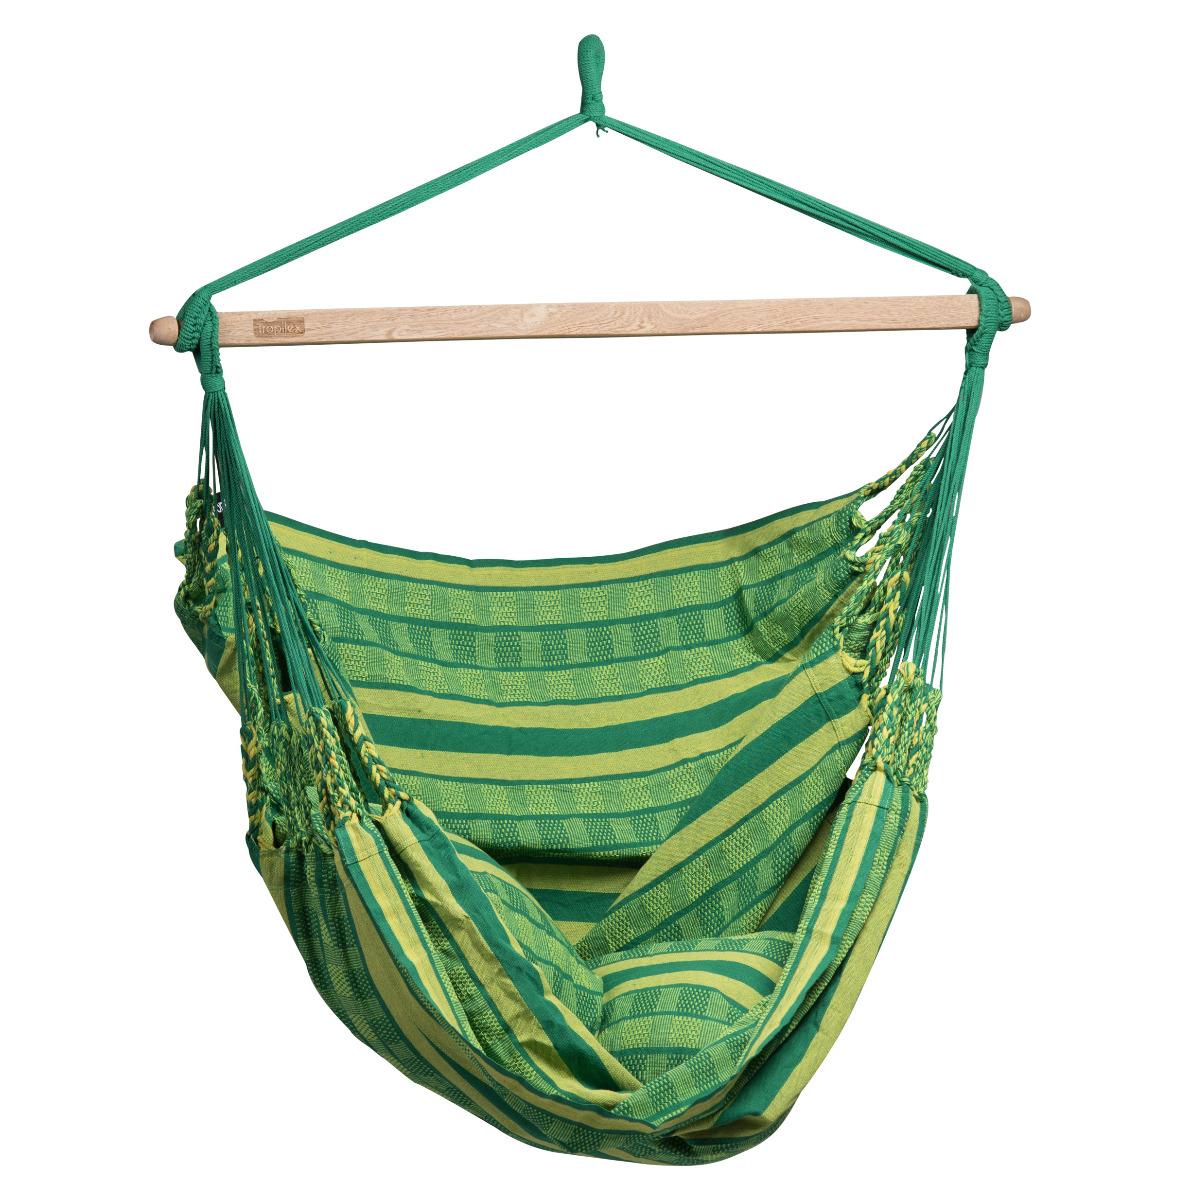 'Chill' Joyful Hangstoel - Groen - Tropilex �